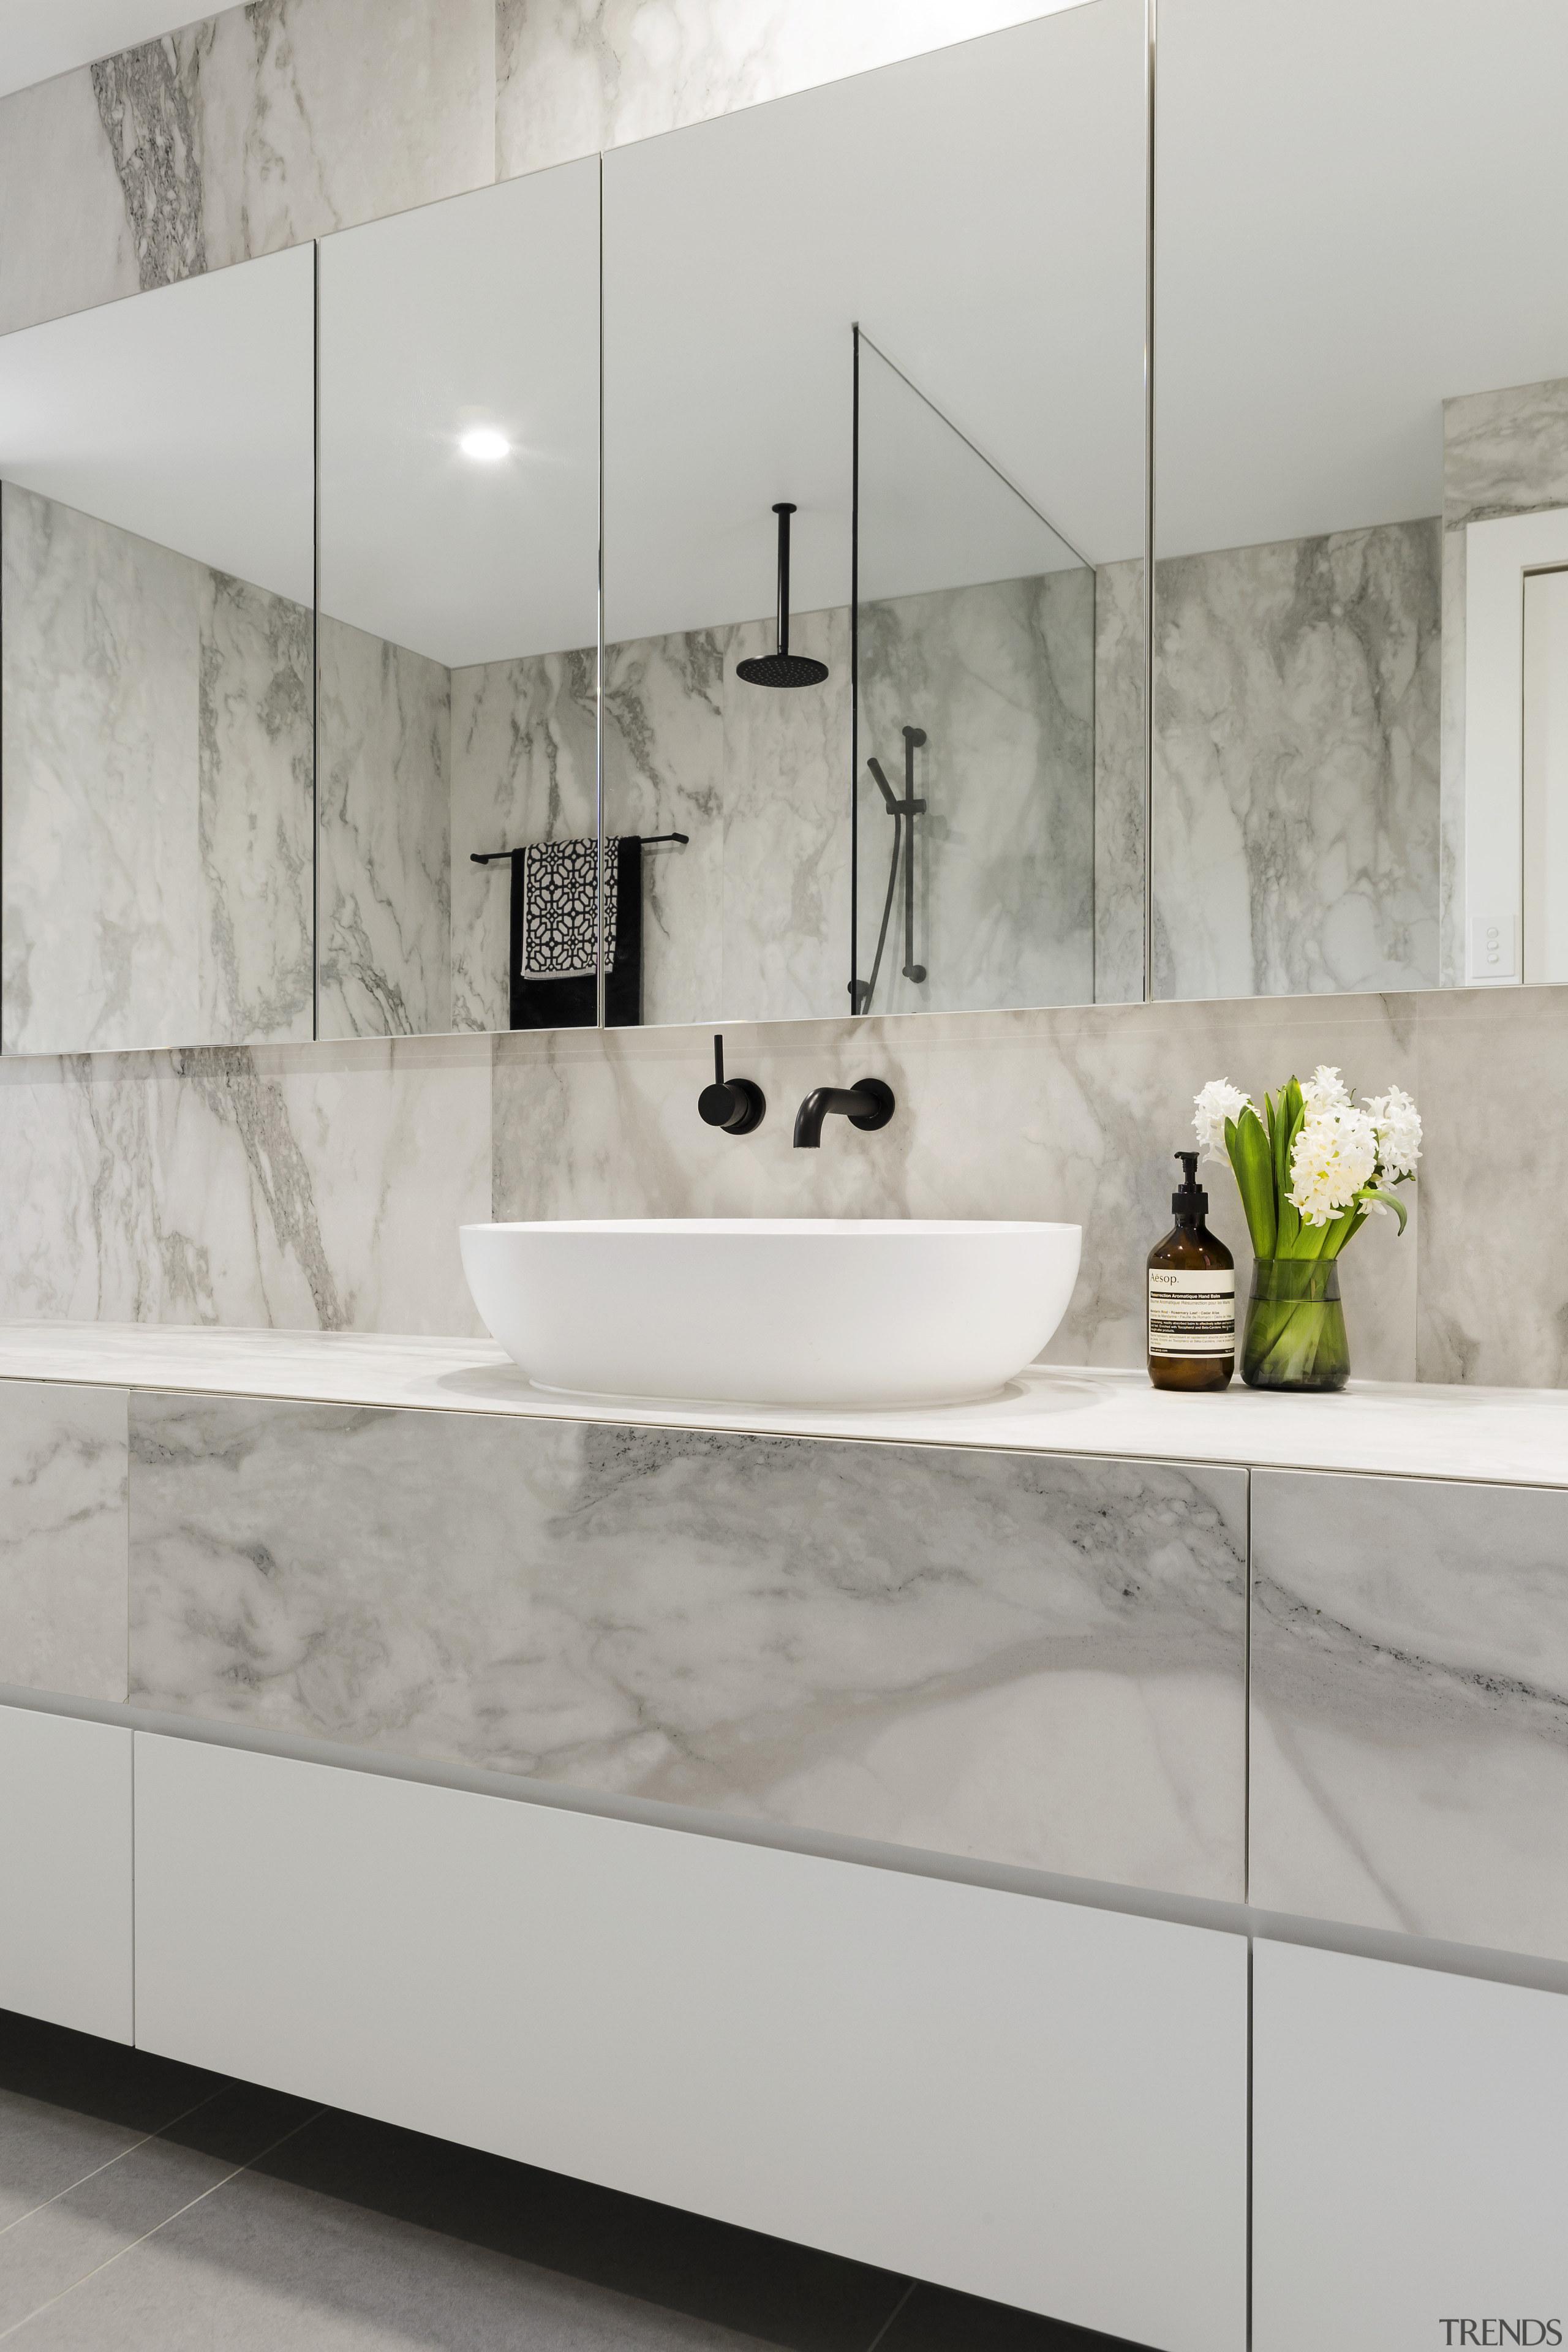 As well as the extensive wall of under bathroom, ceramic, countertop, floor, flooring, interior design, plumbing fixture, product design, sink, tap, tile, wall, gray